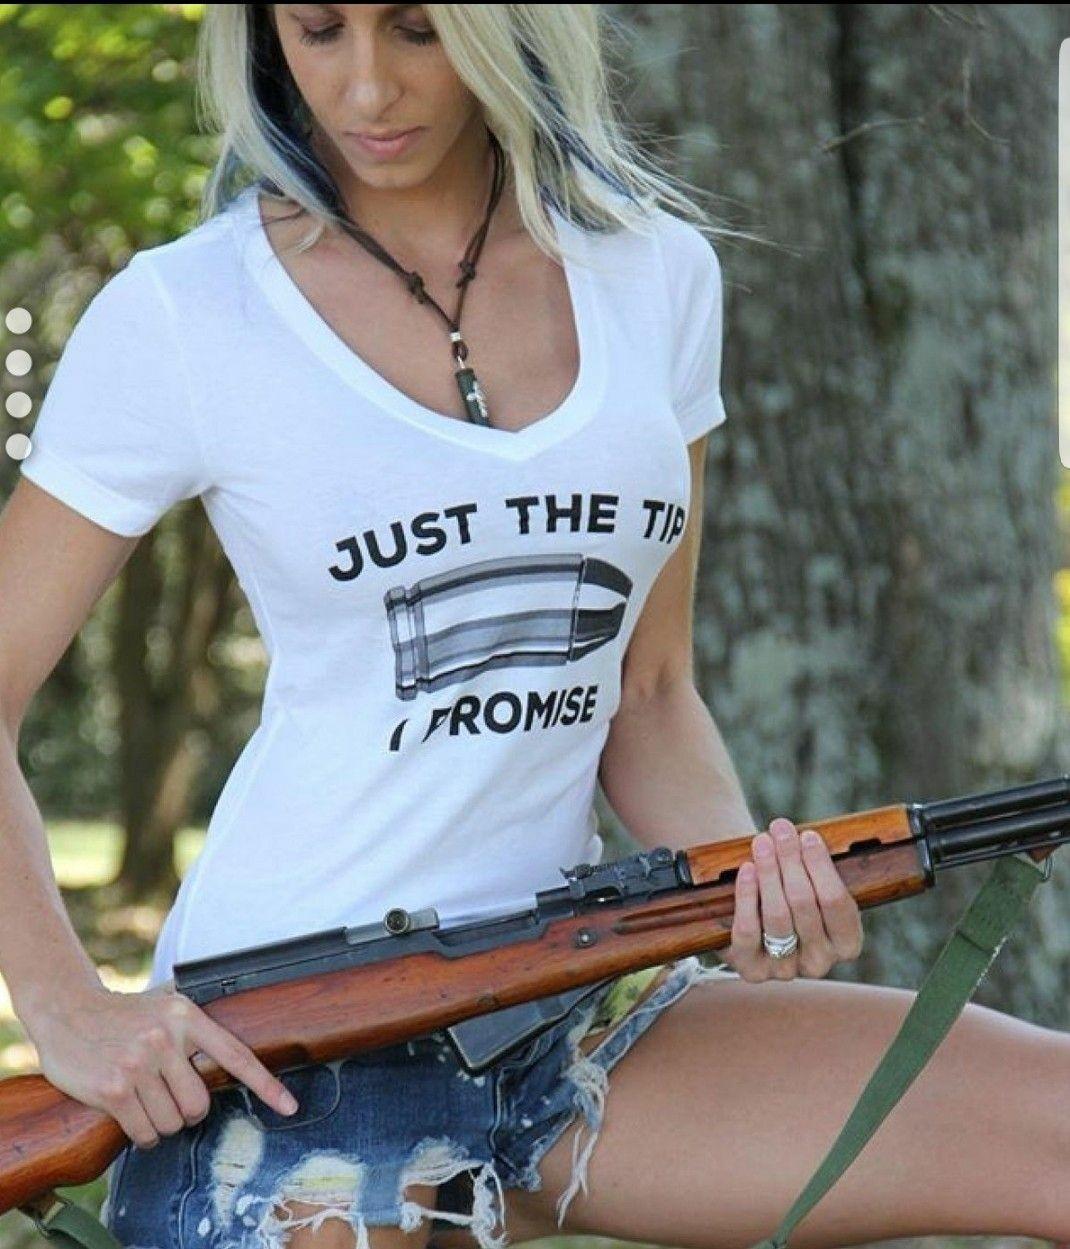 Bikini and guns pussy